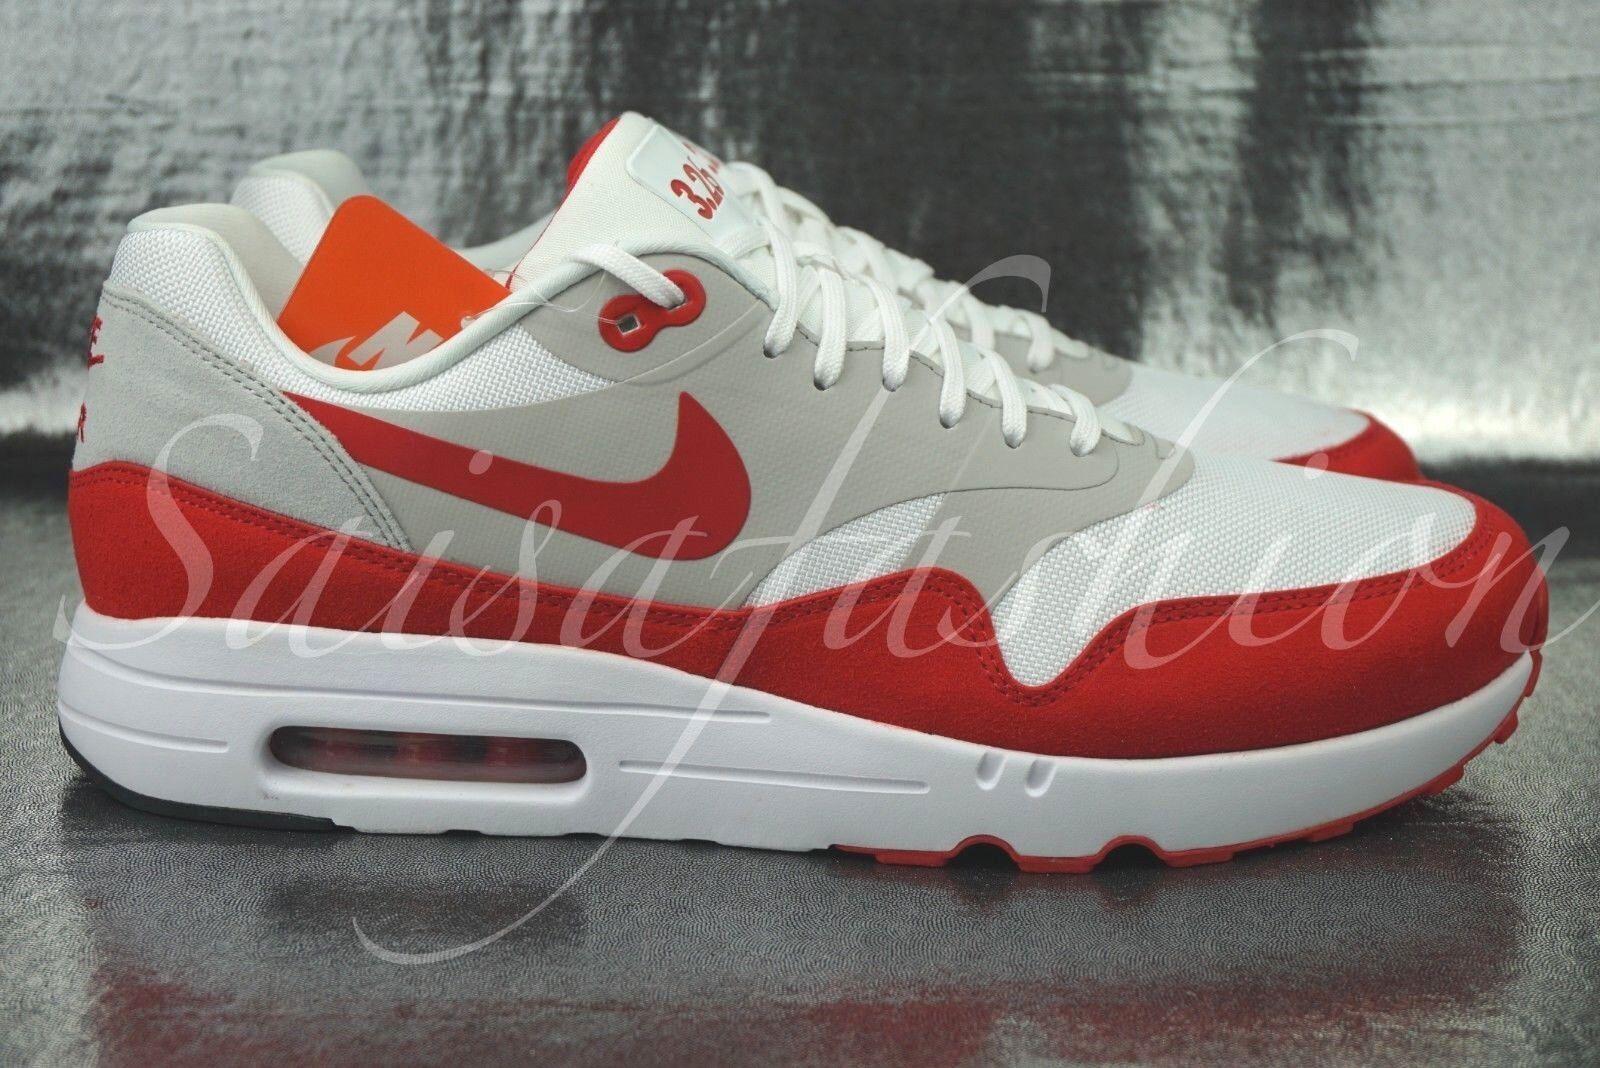 Nike air max 1 ultra 2.0 le og